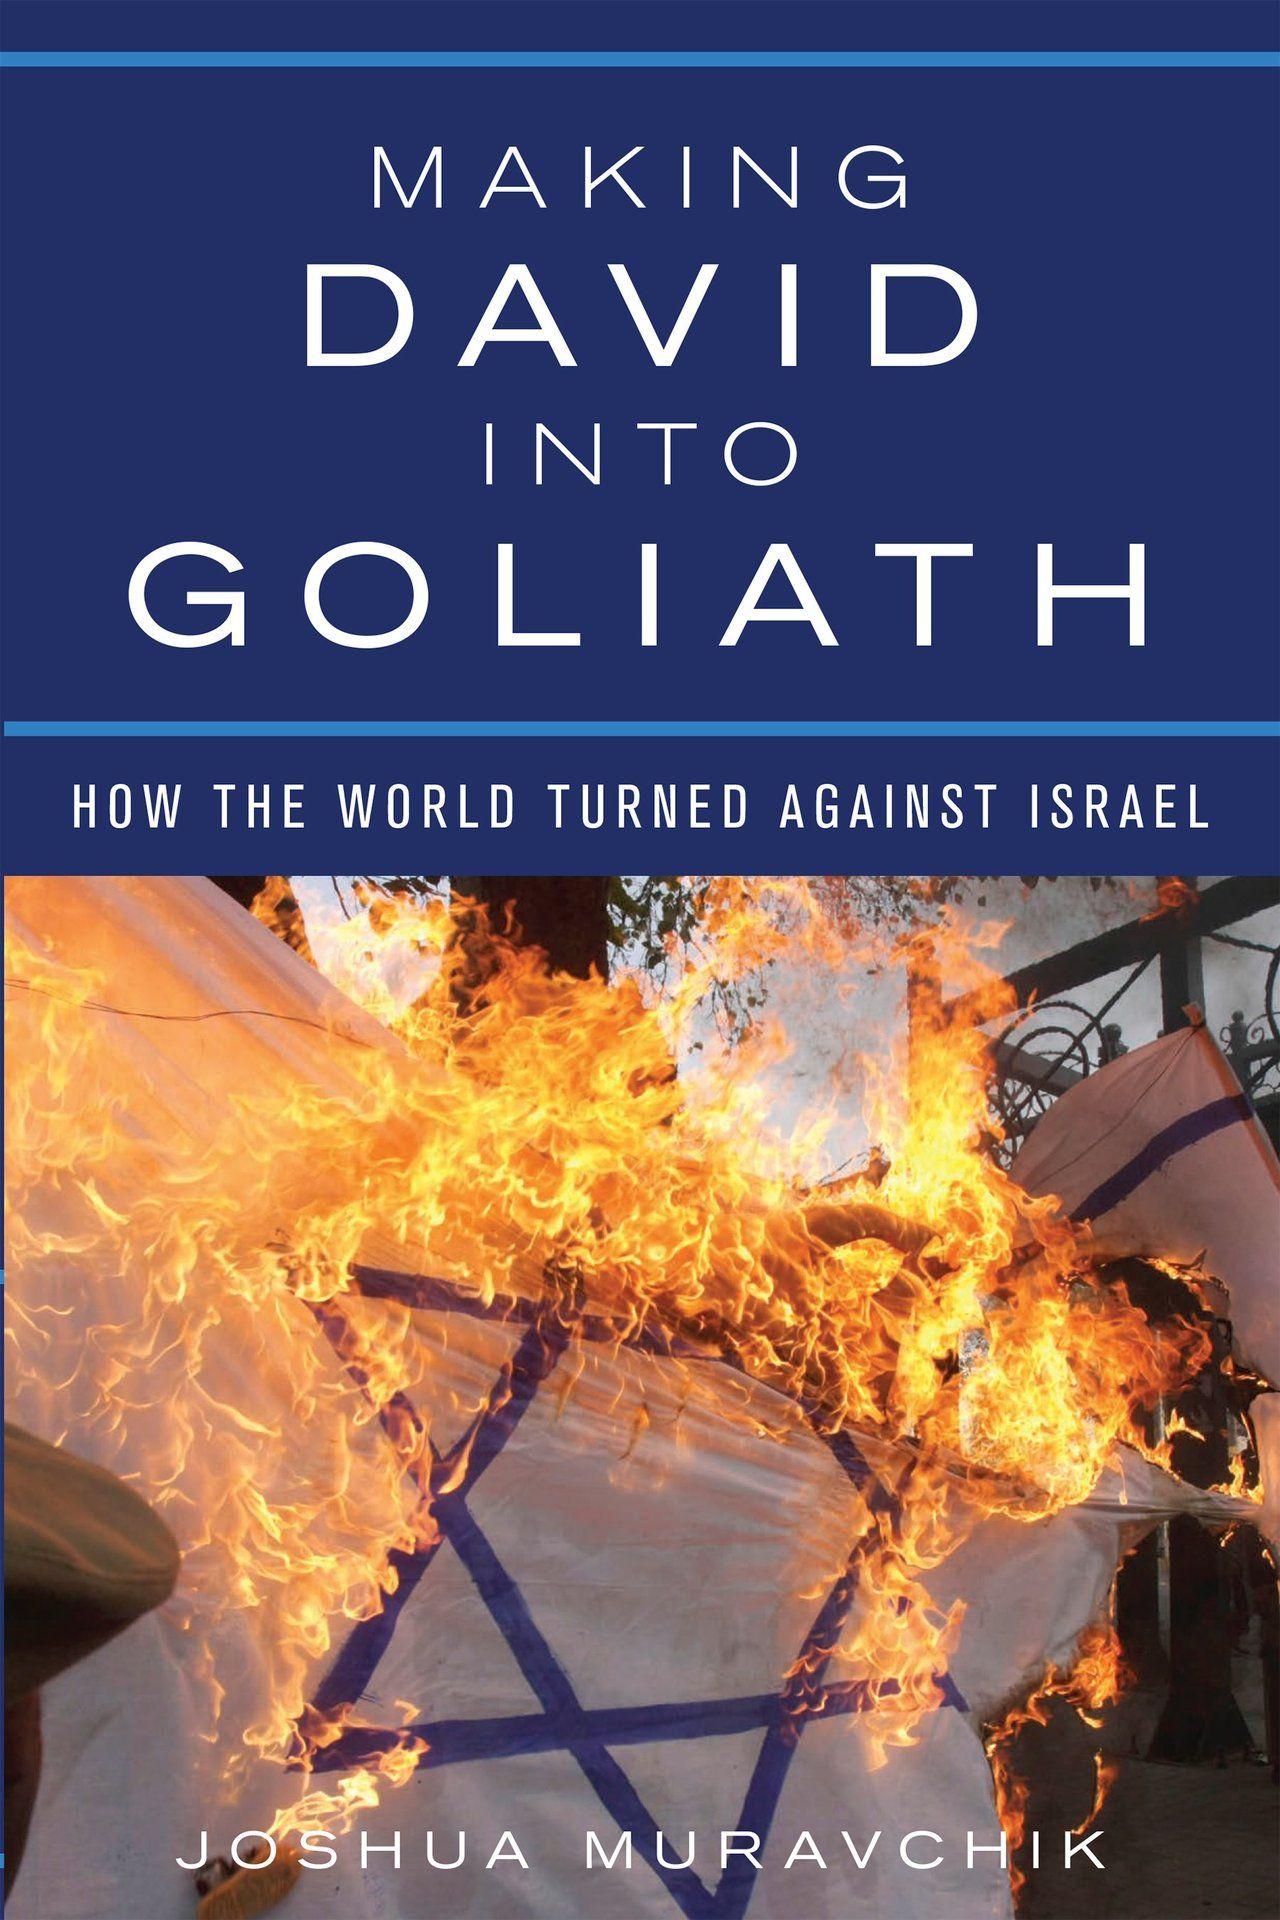 David into Goliath, Muravchik